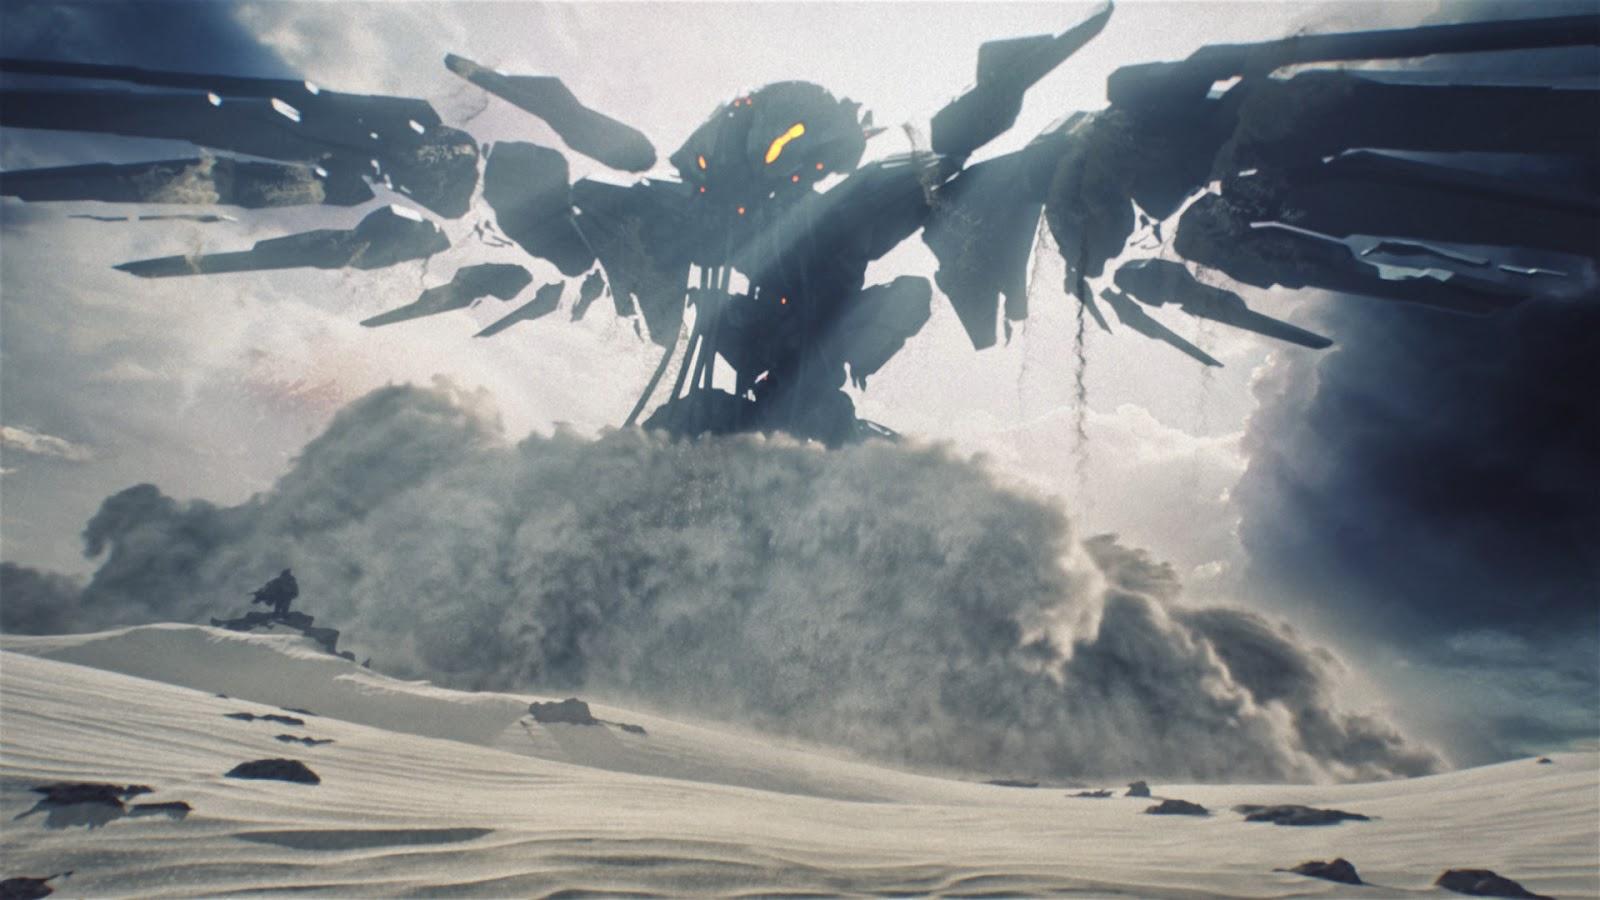 Halo 5 wallpaper HD 1600x900